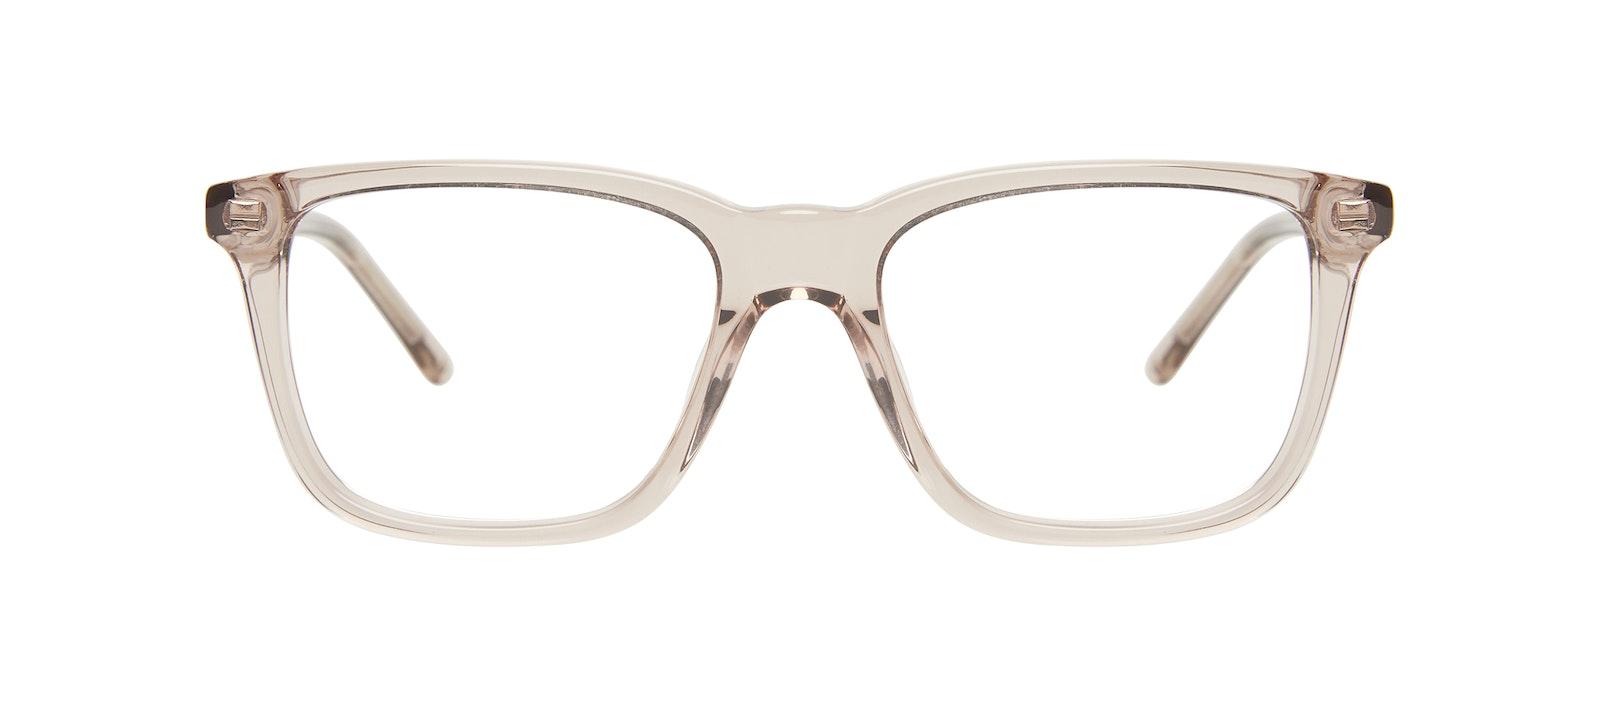 Affordable Fashion Glasses Square Eyeglasses Kids Code Junior Sand Front